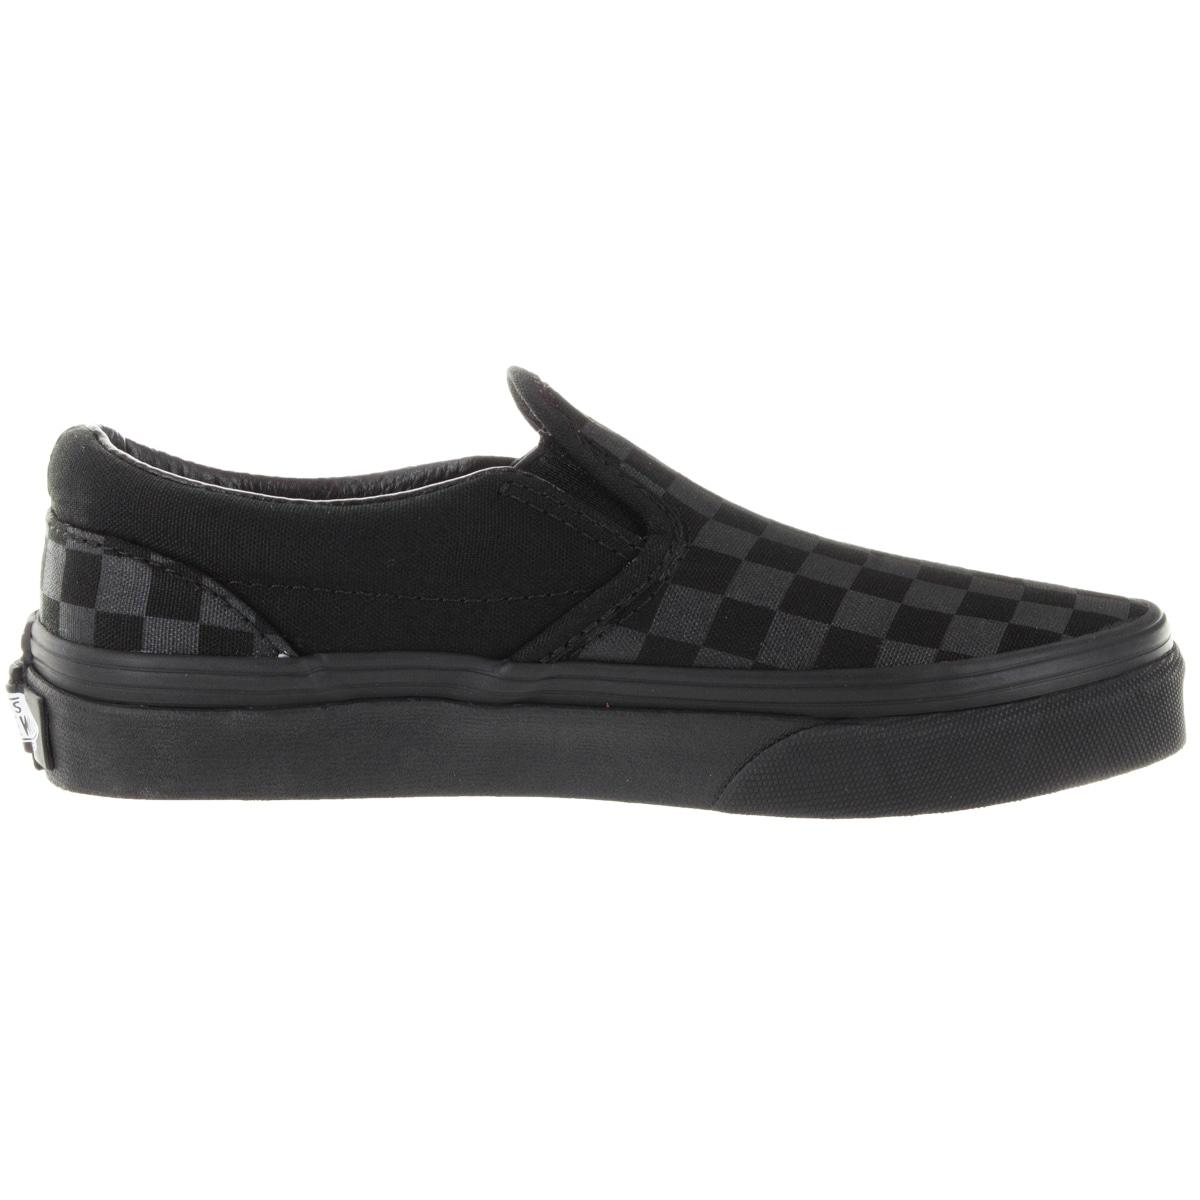 vans classic slip on black monochrome checkerboard